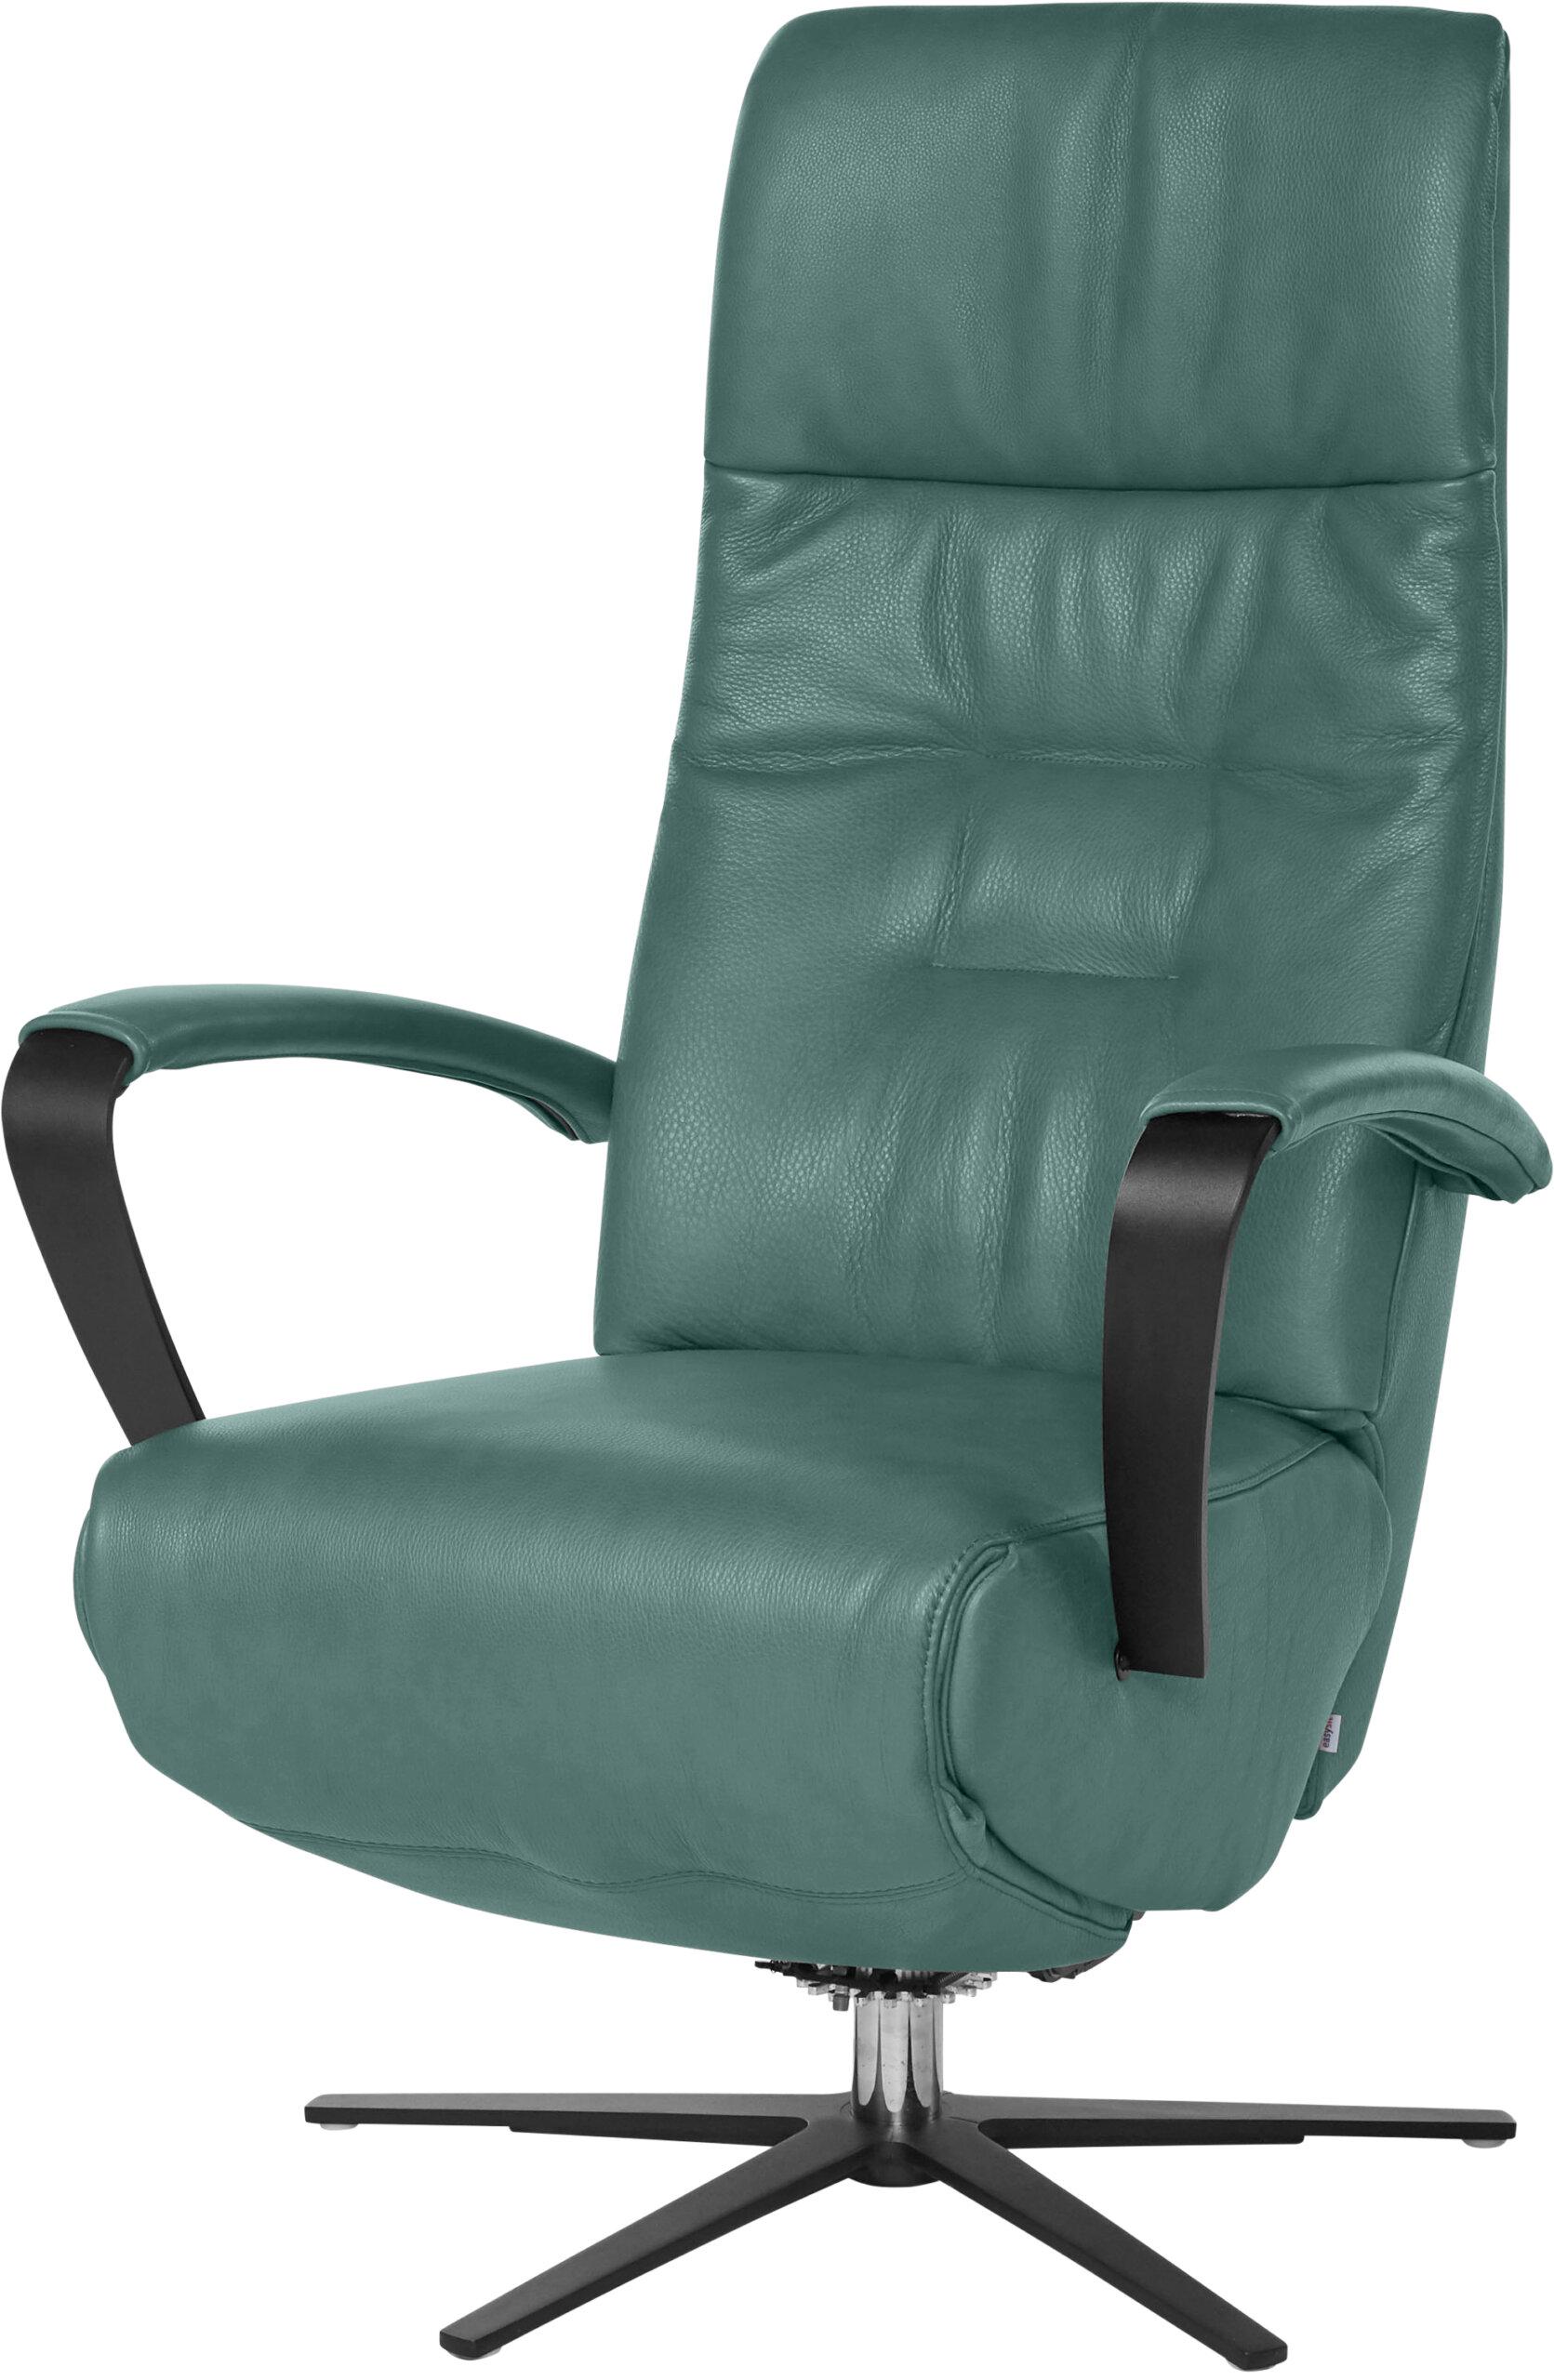 Sta op stoel Easysit D72